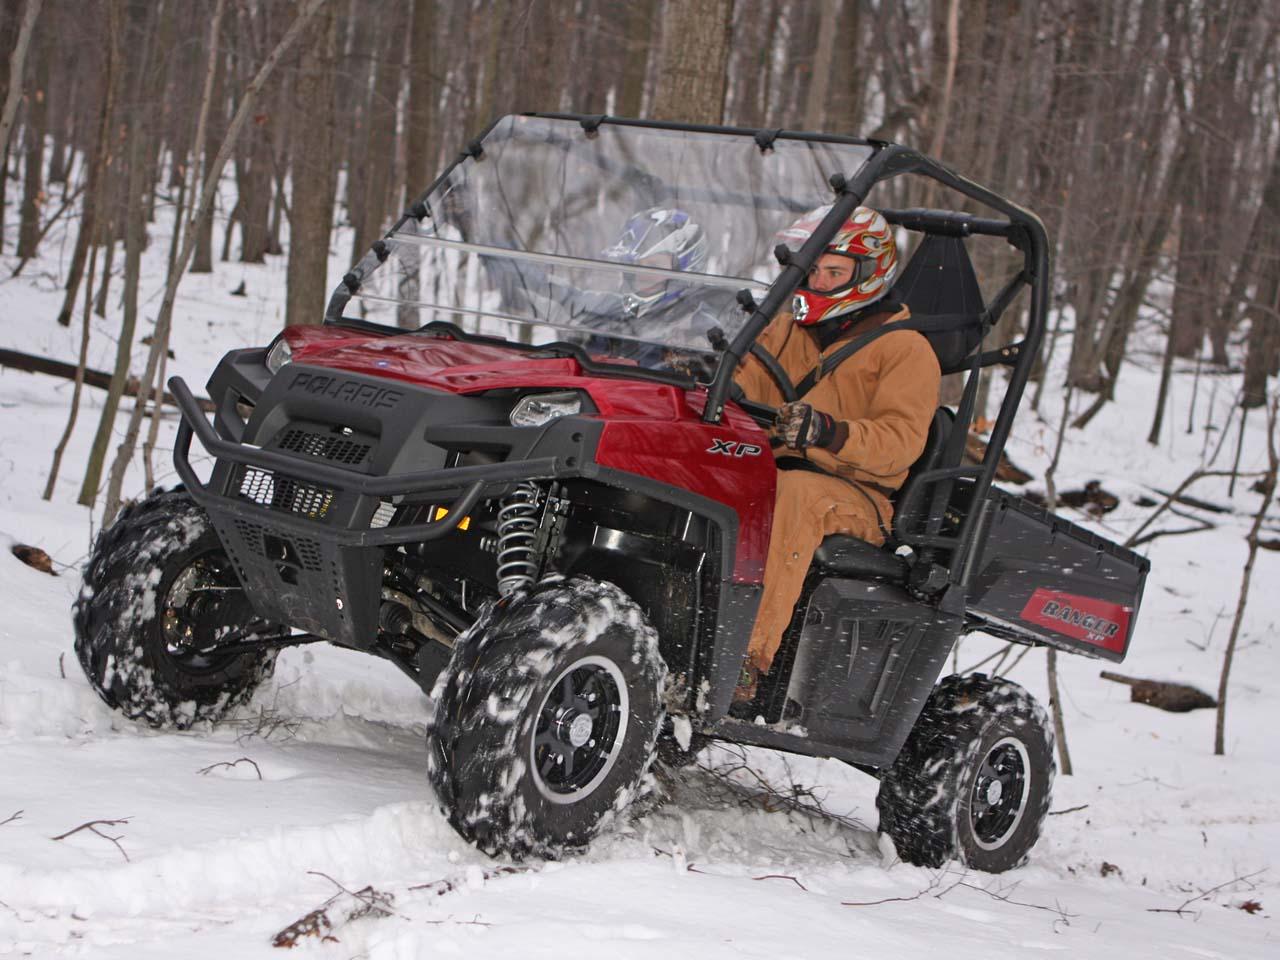 2010.polaris.ranger-xp.seizmik.versa-shield.red_.front-left.riding.on-snow.jpg